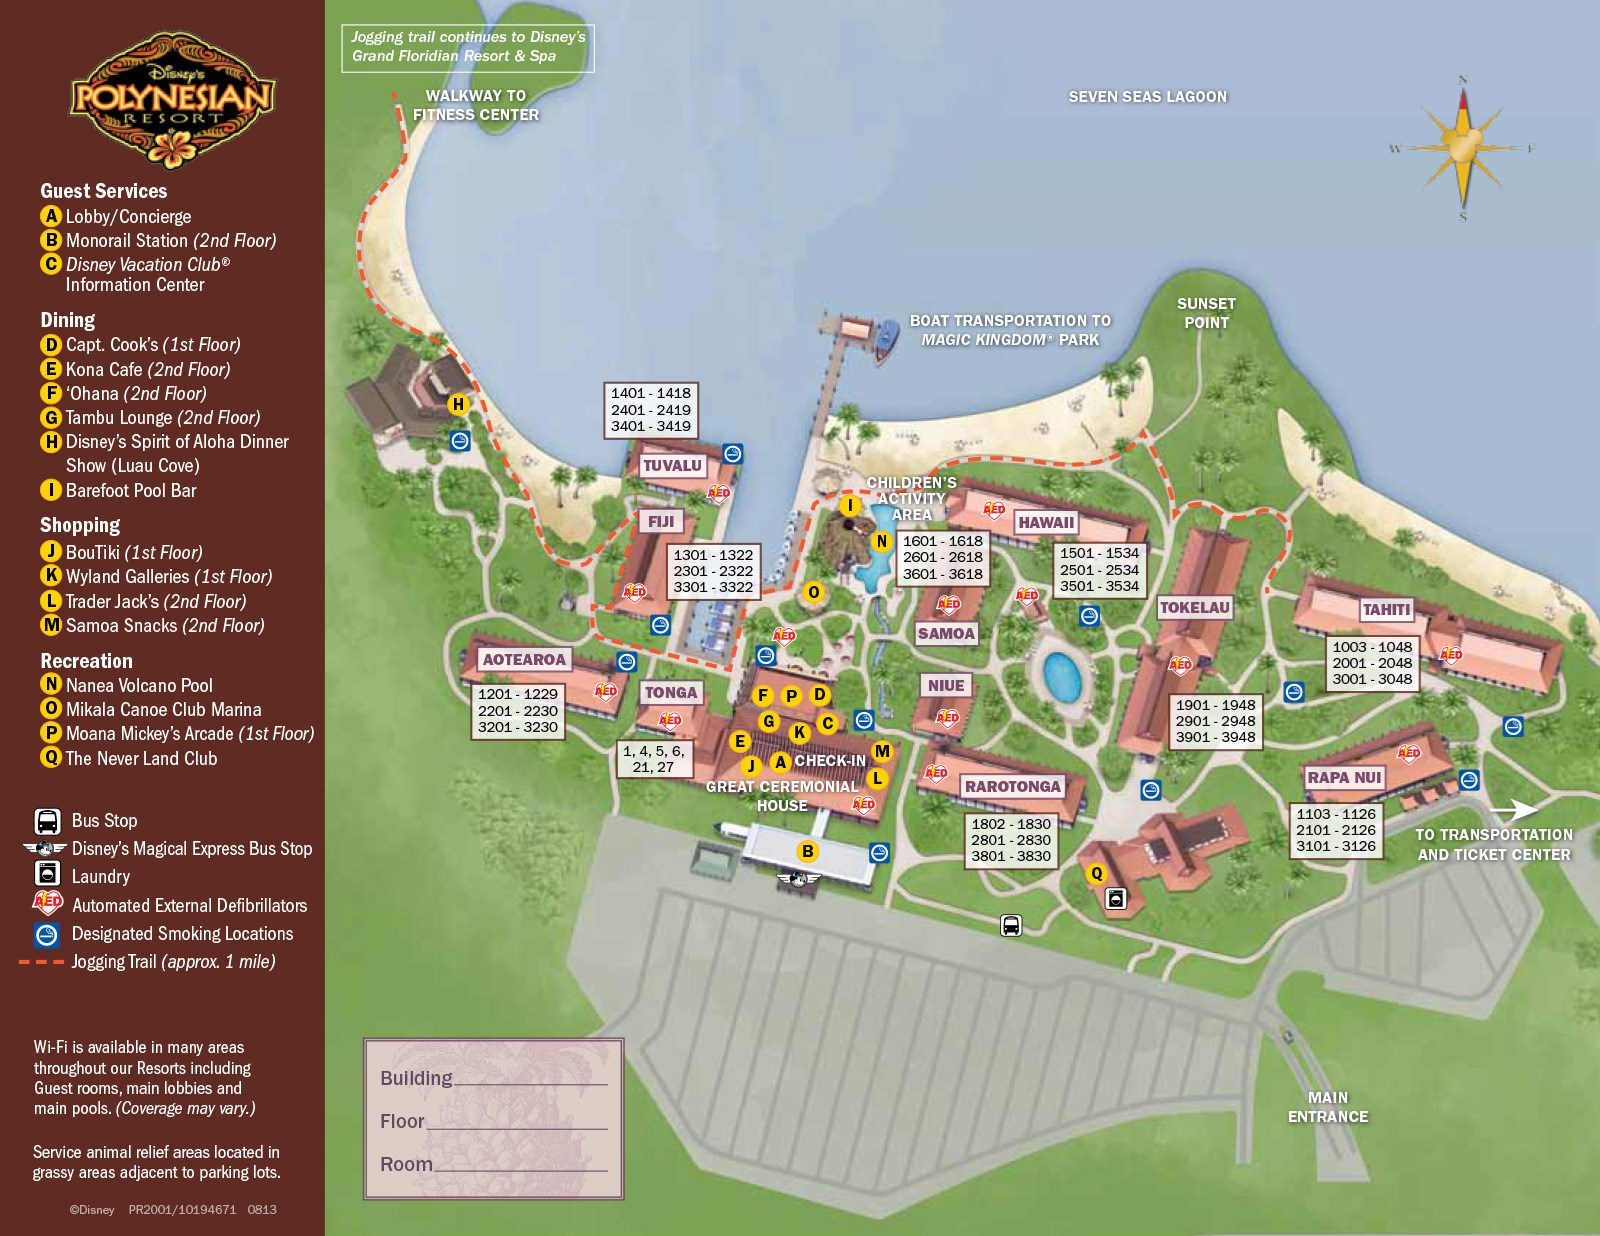 2013 Polynesian Resort guide map